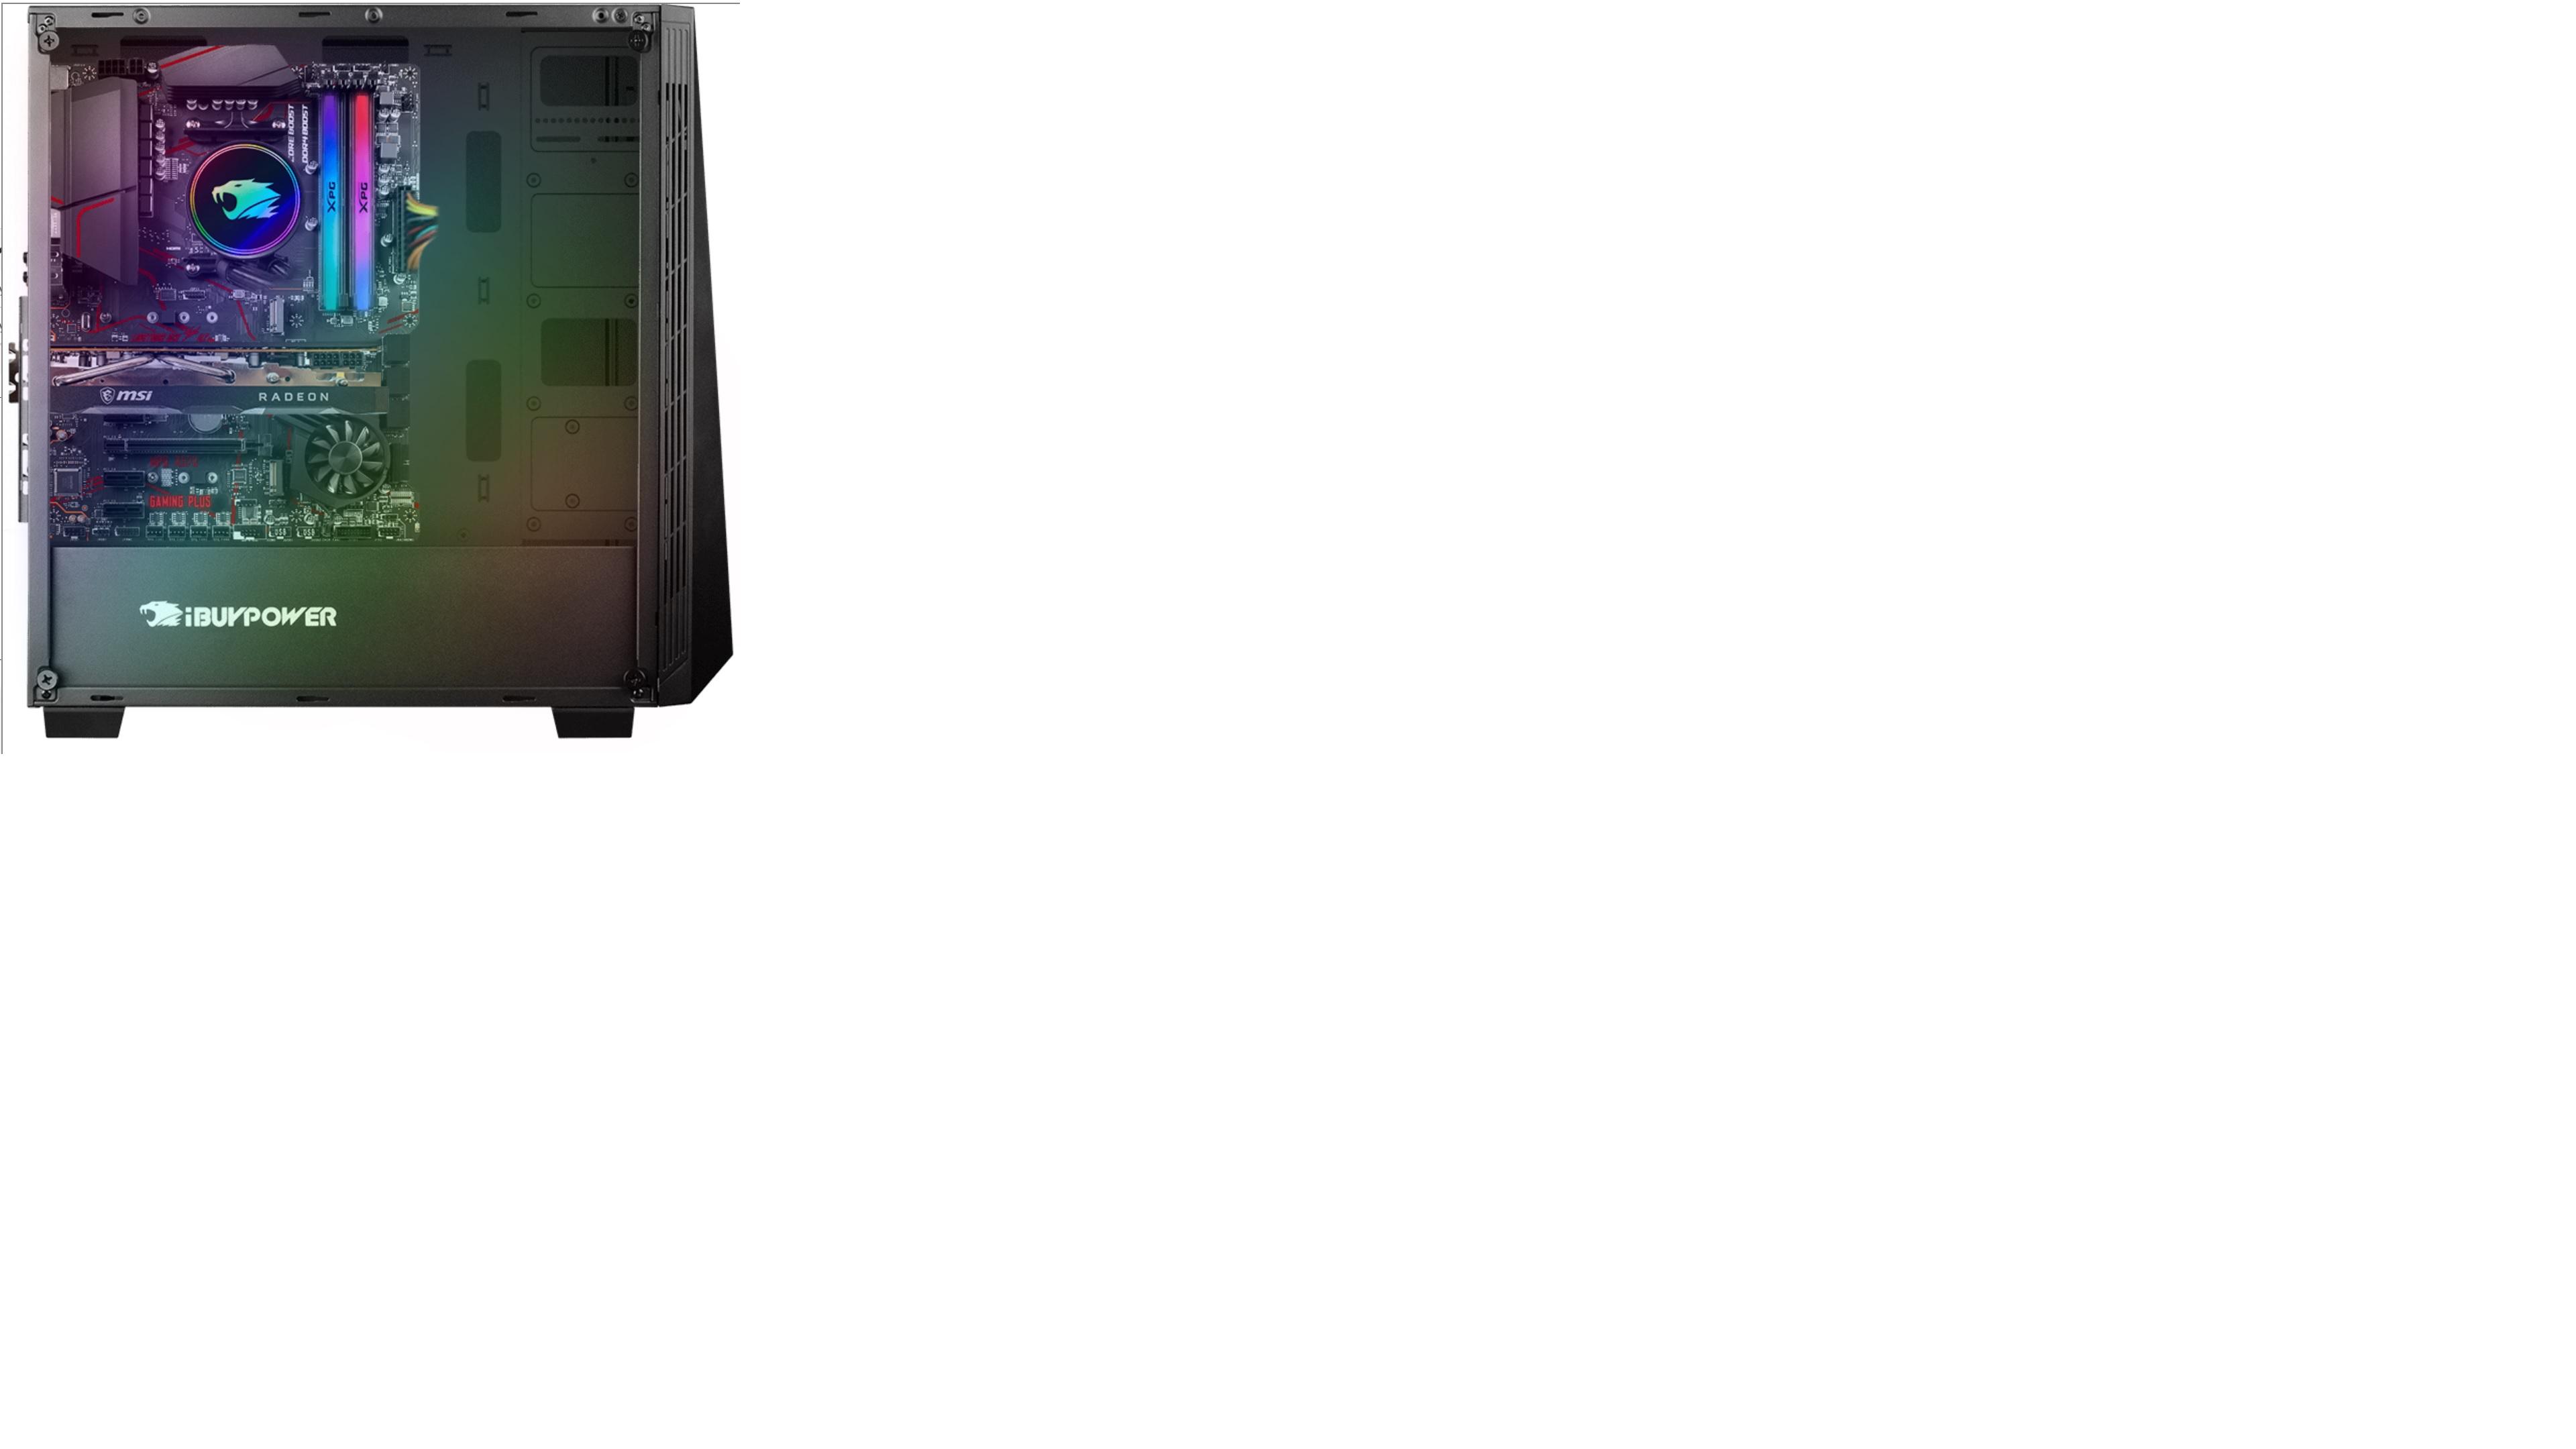 iBuypower Ryzen 3rd Gen: Ryzen 7 3700X, 240mm Liquid Cooler, 16GB DDR4 3200, 1TB SSD, RX 5700XT, 600W PSU, Win10H @ $1169.45, no-OS $1112.45 + F/S